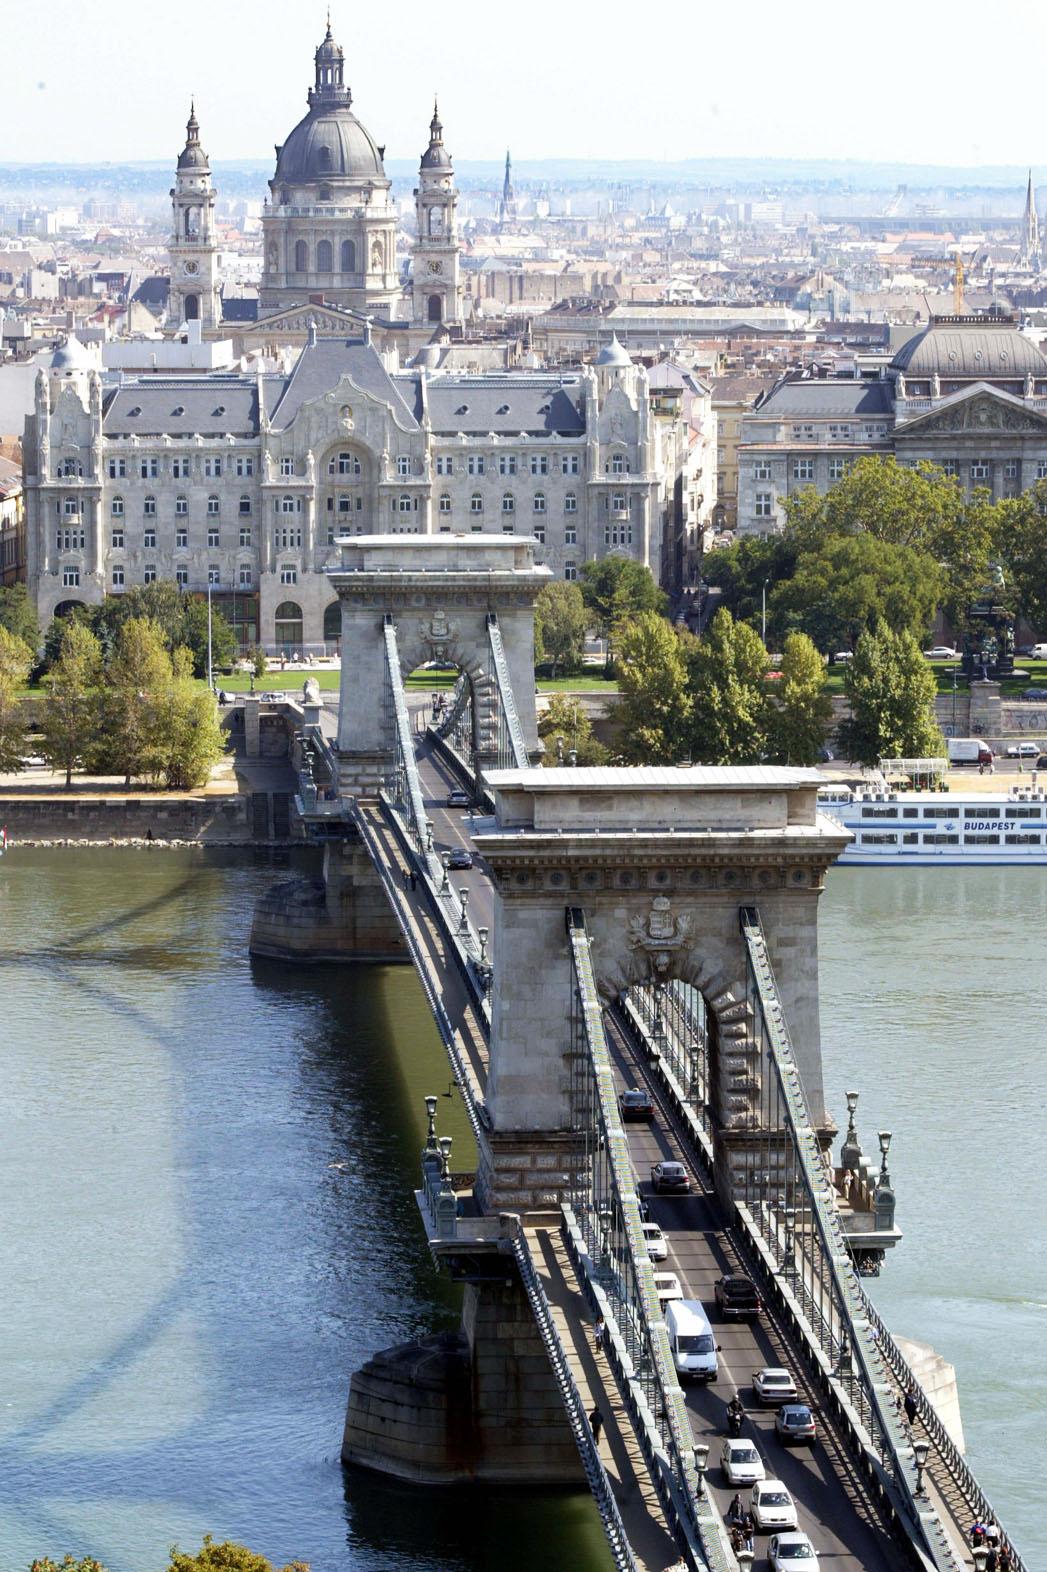 Budapest, Hungary - P 2013